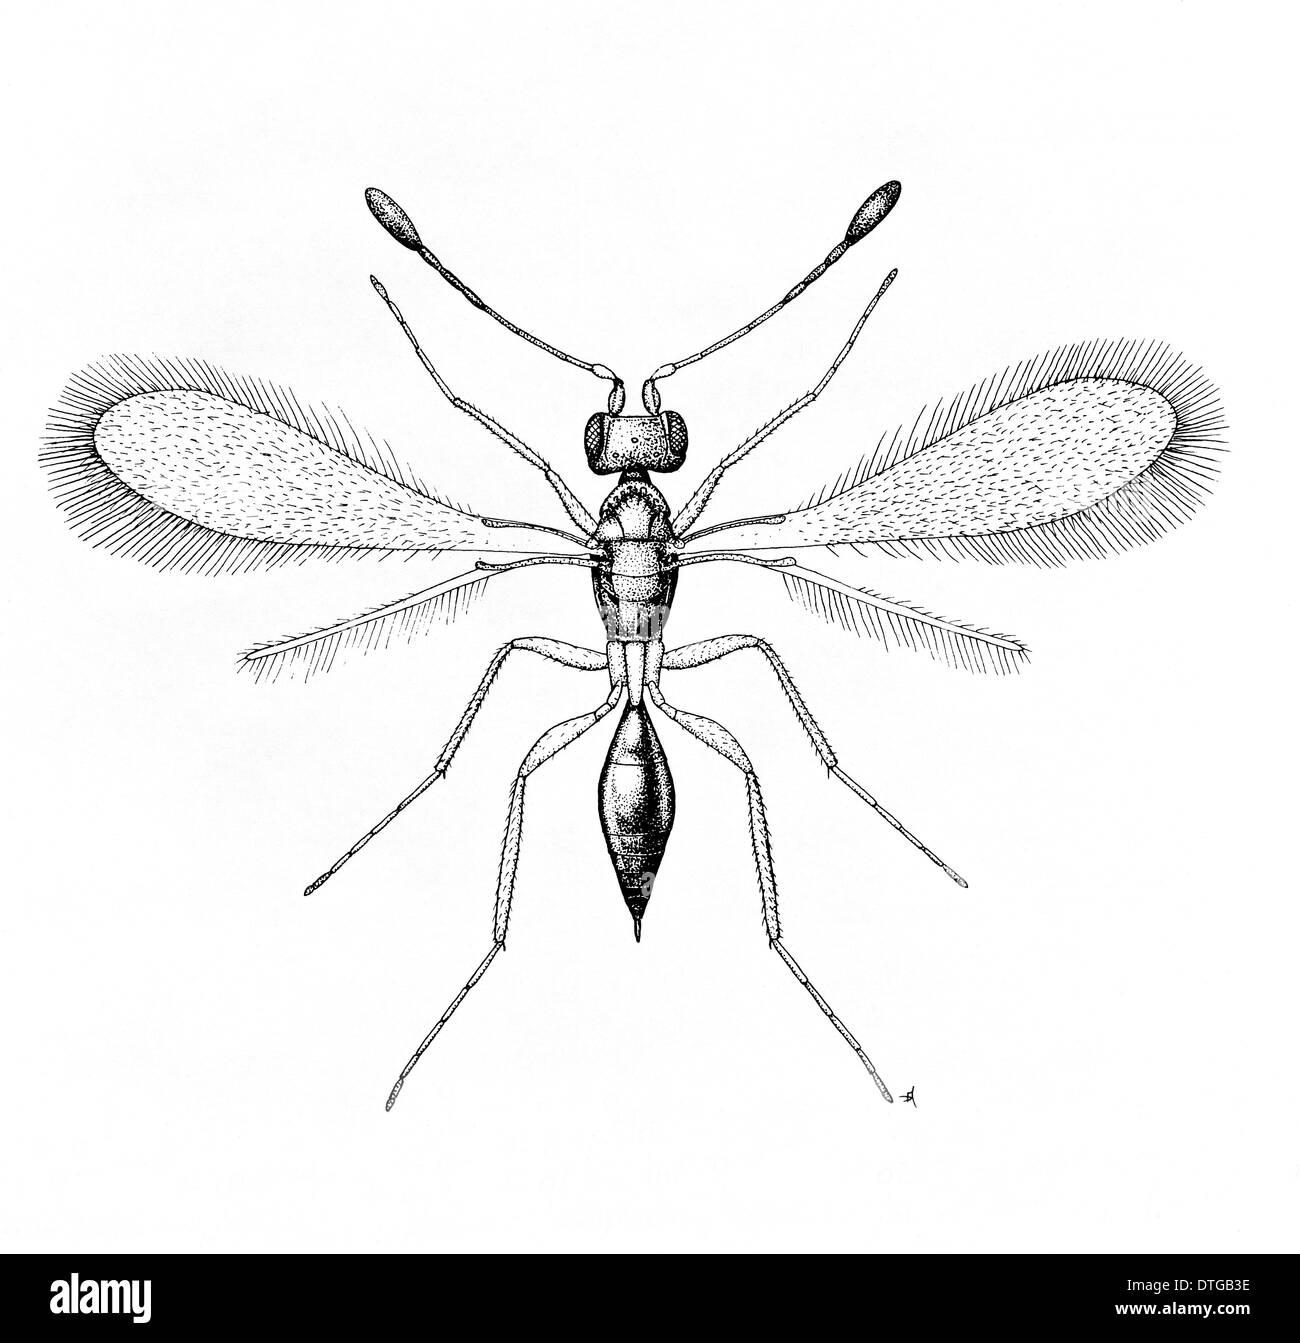 Alaptus Magnanimus, Feen fliegen Stockbild